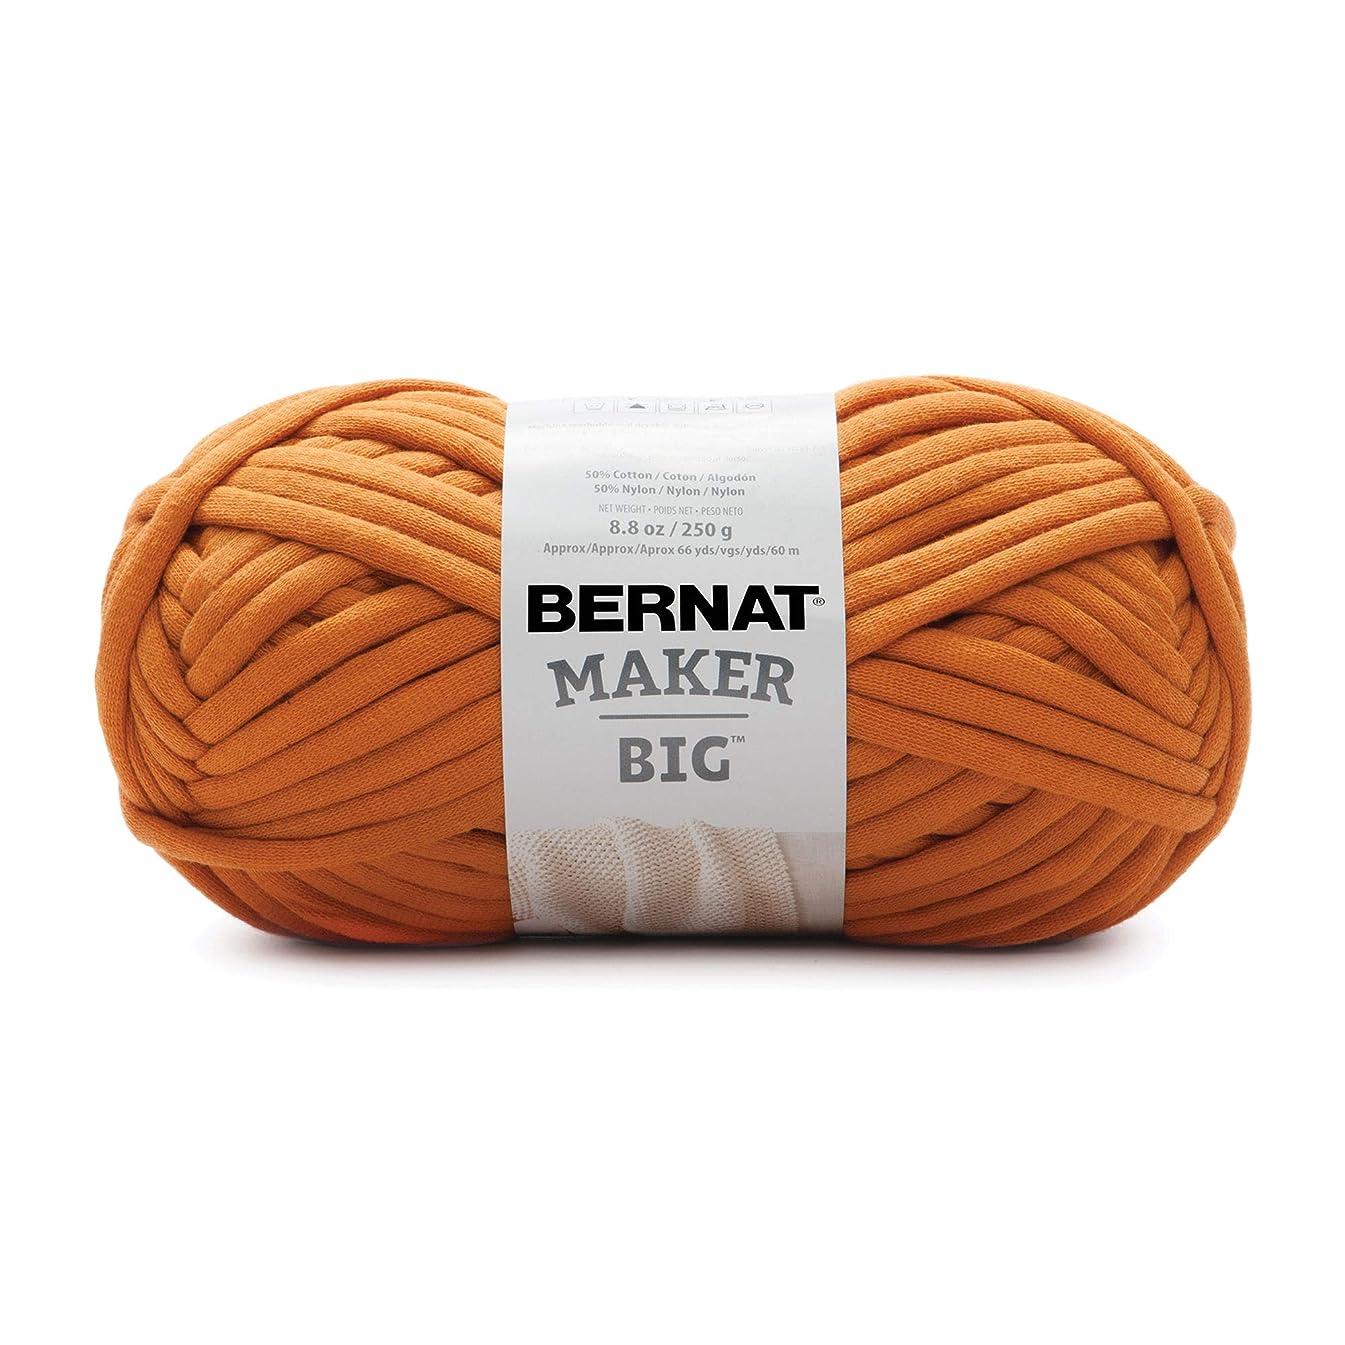 Bernat 16122525009 Maker Big Yarn Amber